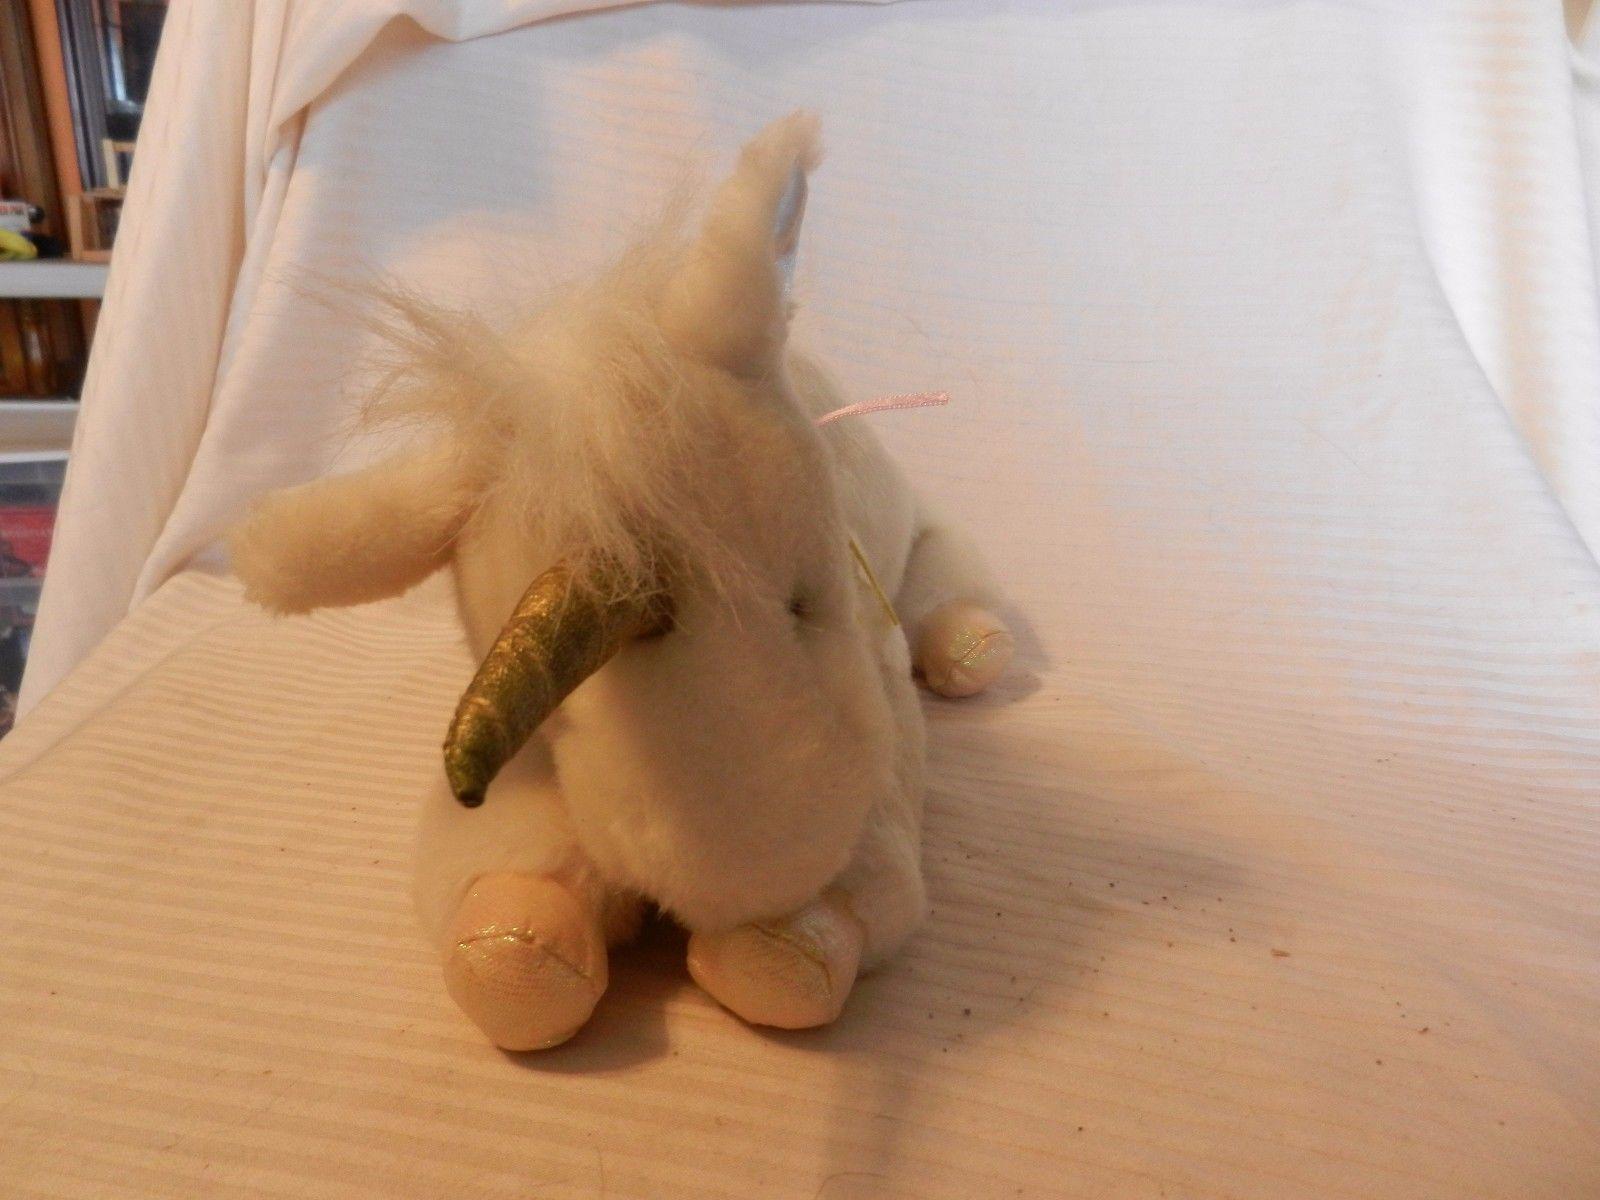 c8c37ba917a8 White Plush Stuffed Unicorn Laying Down, and 13 similar items. S l1600